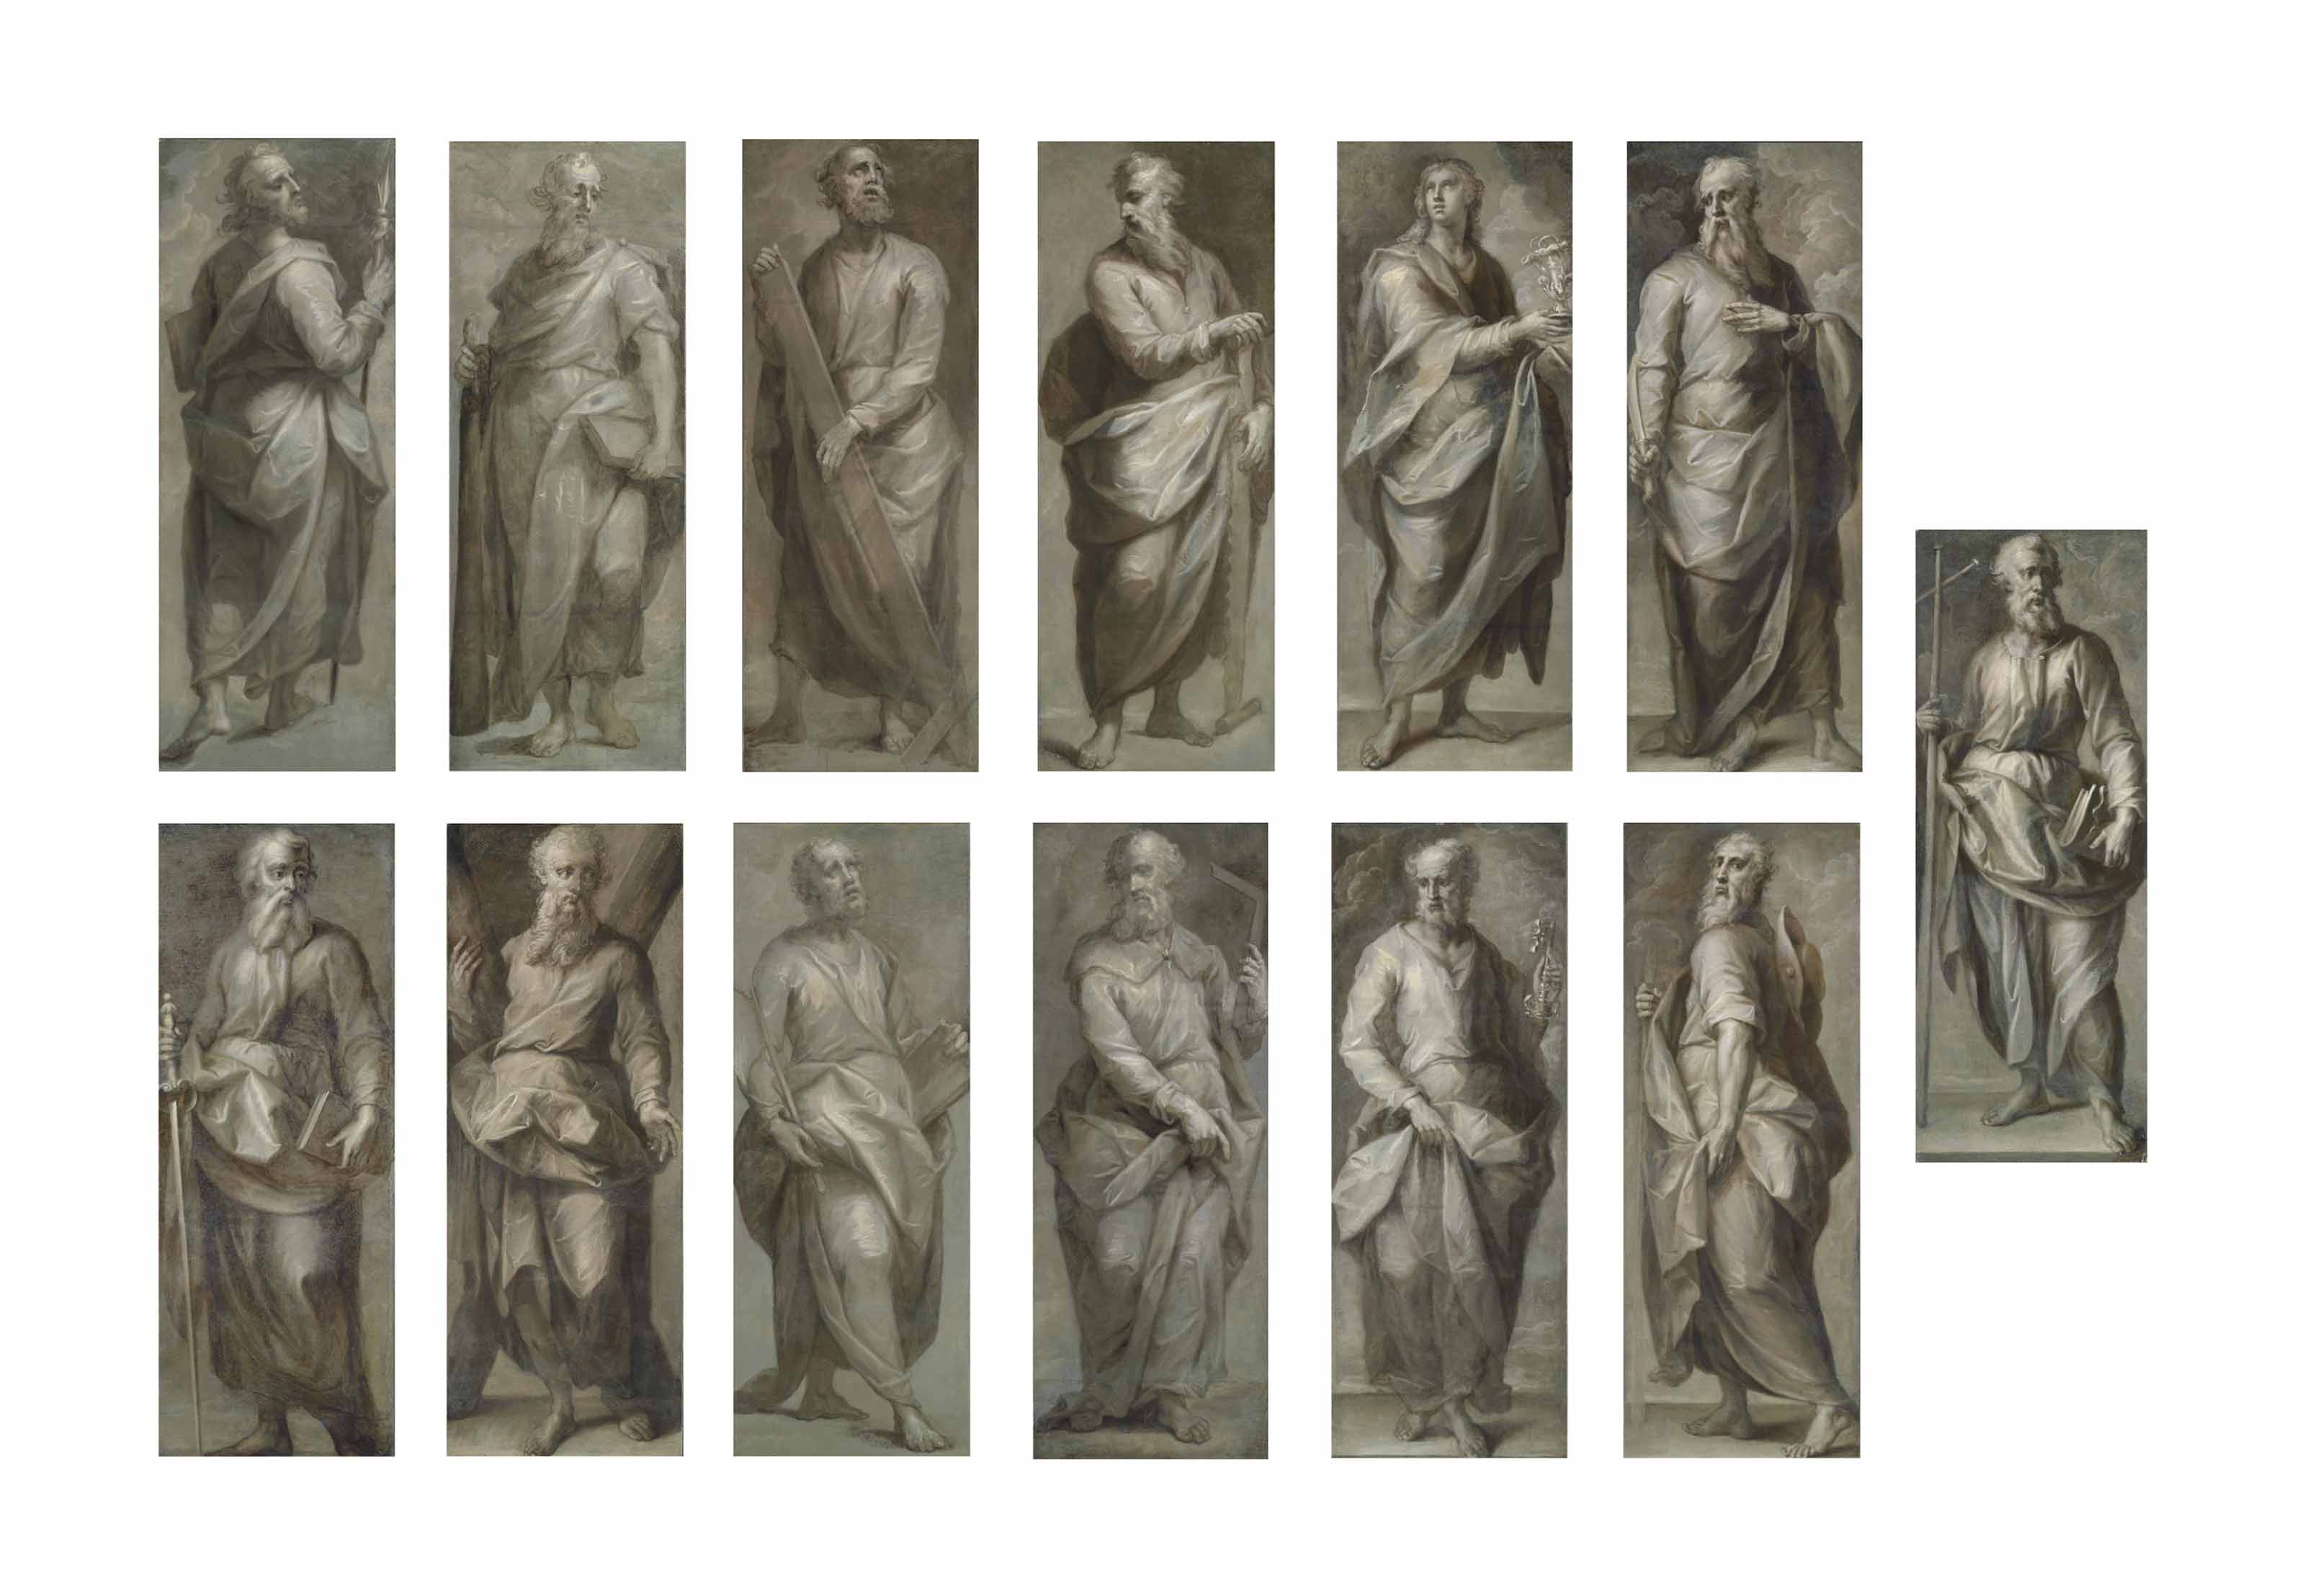 The Twelve Apostles: Saints Andrew, Thomas, Philip, Bartholomew, Simon Zealot, Mathias, James the Great, Jude, Matthew, Peter, James the Less and John; and Saint Paul